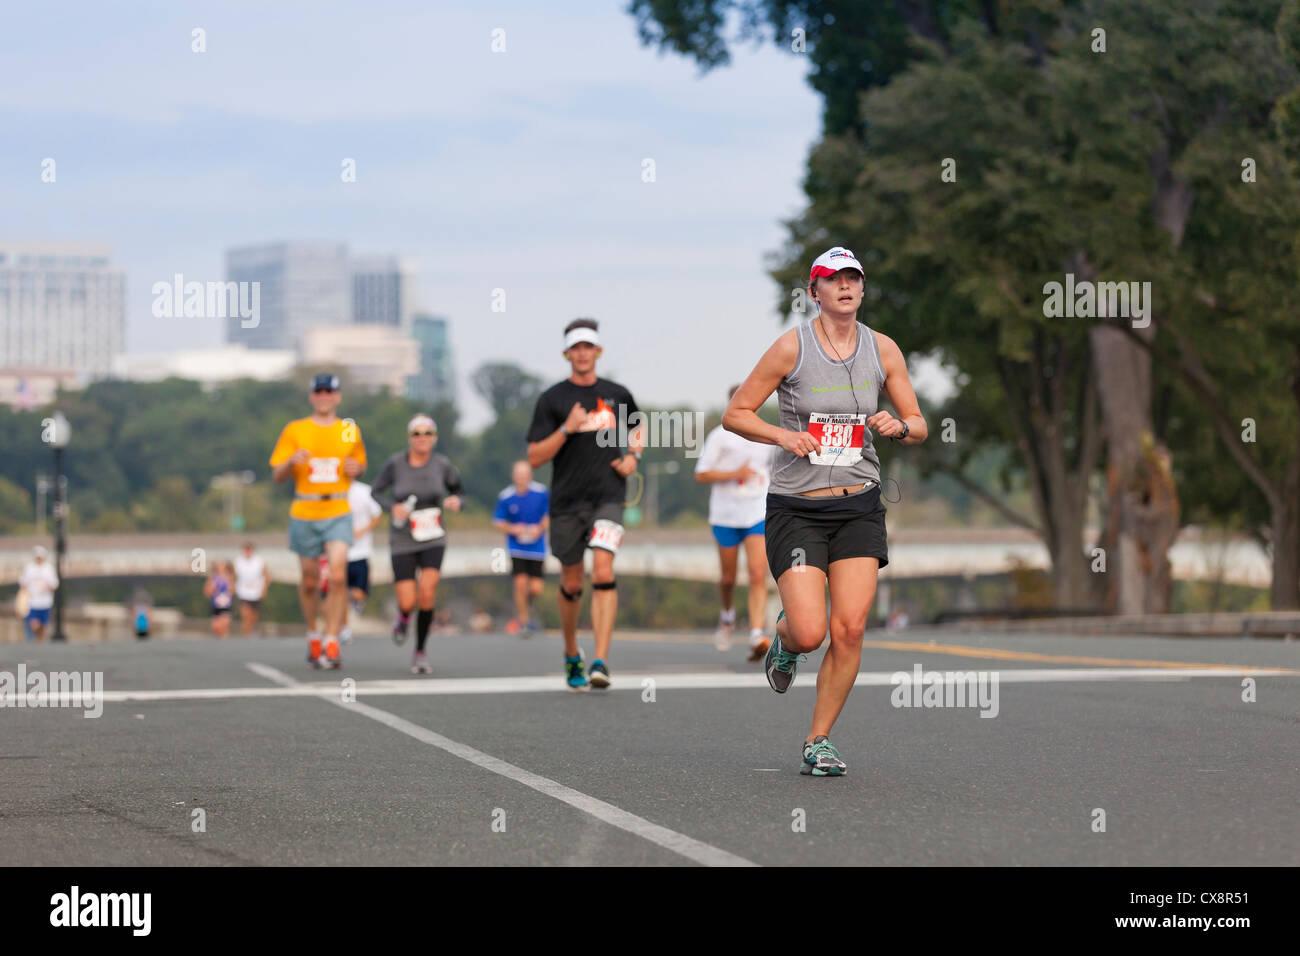 La maratona corridori Immagini Stock